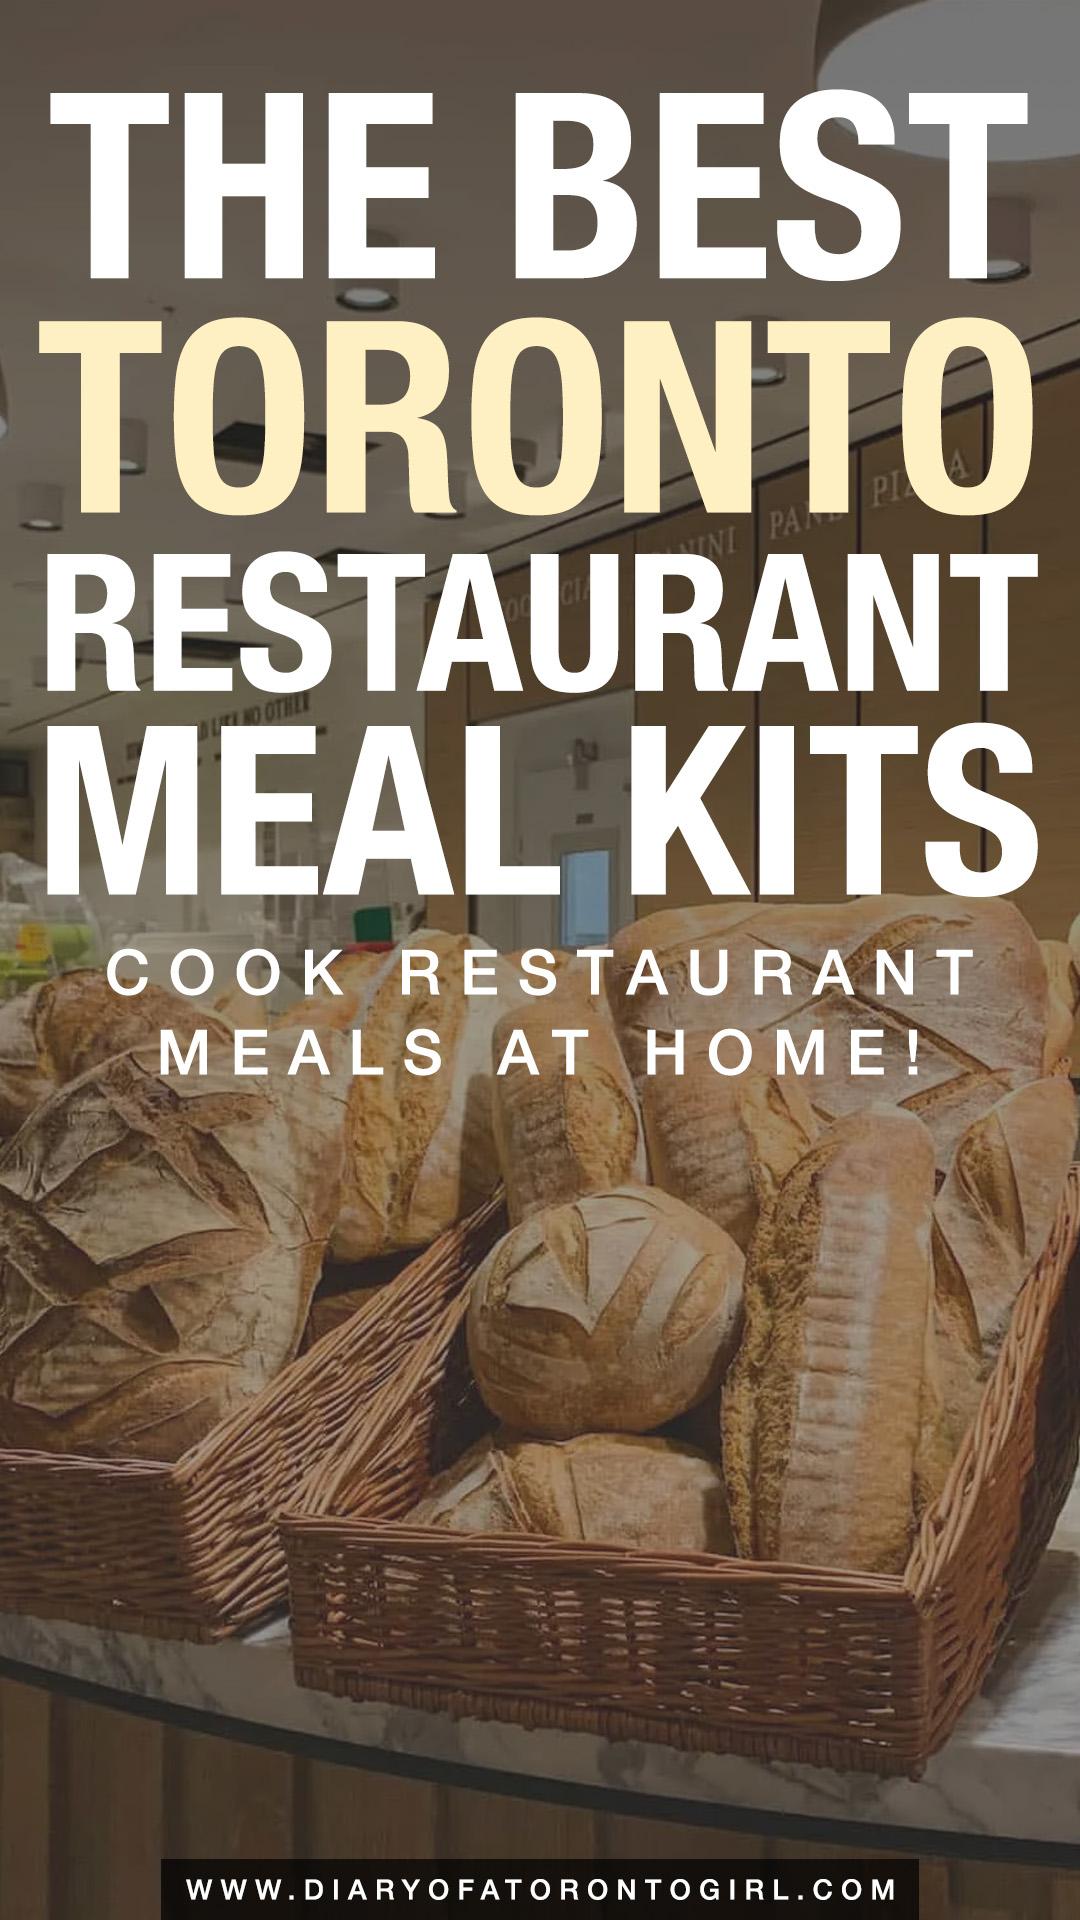 The best Toronto restaurant meal kits